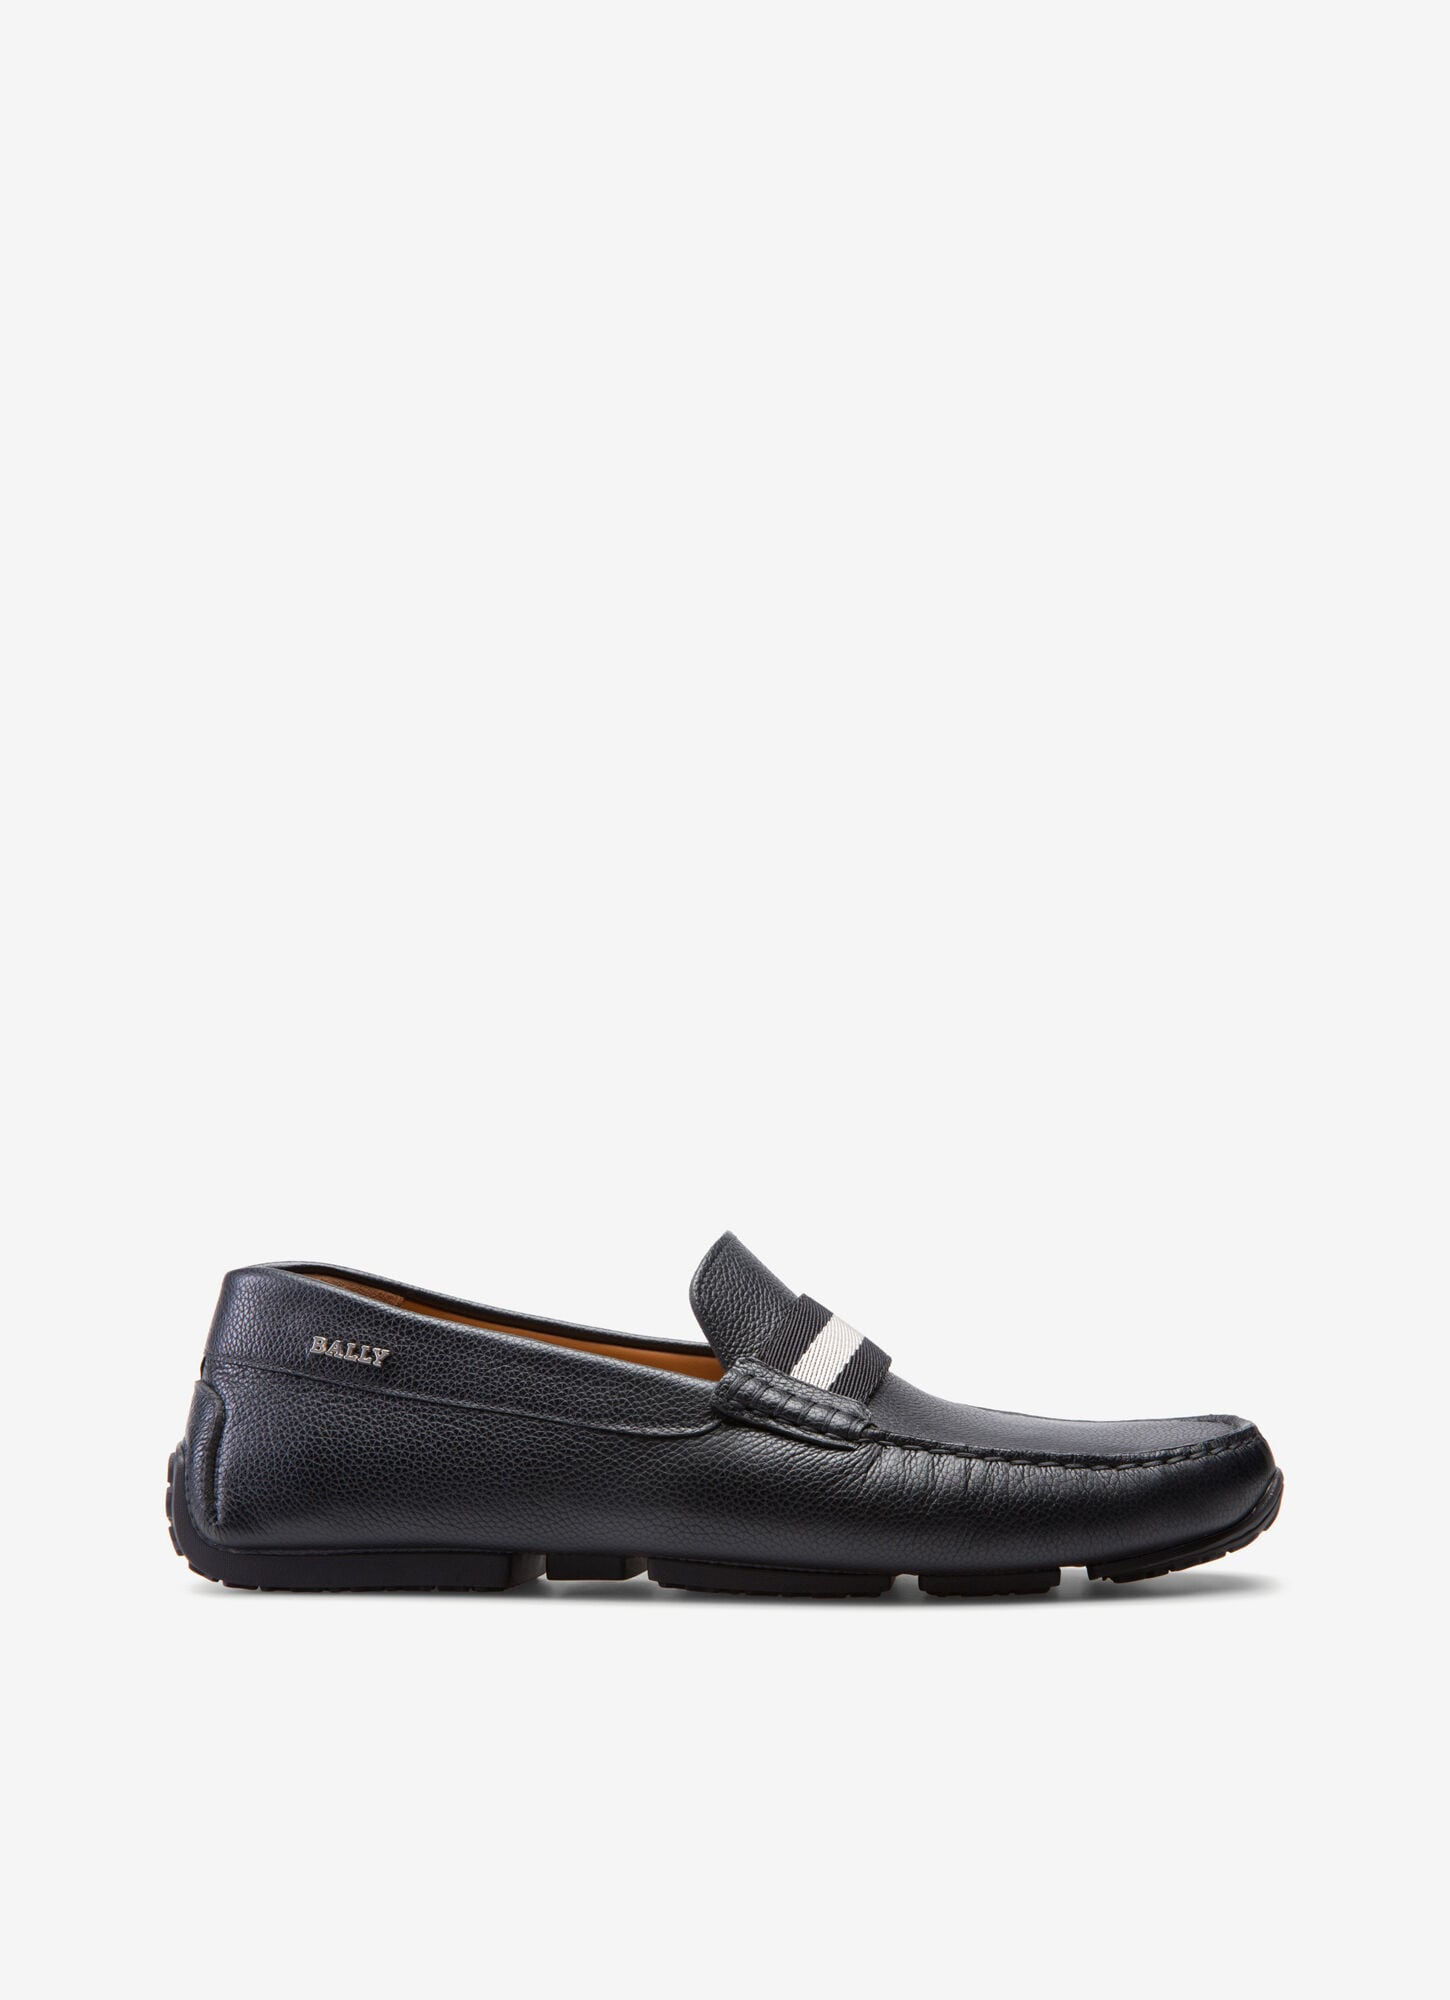 PEARCE   Men's Drivers   Bally Shoes